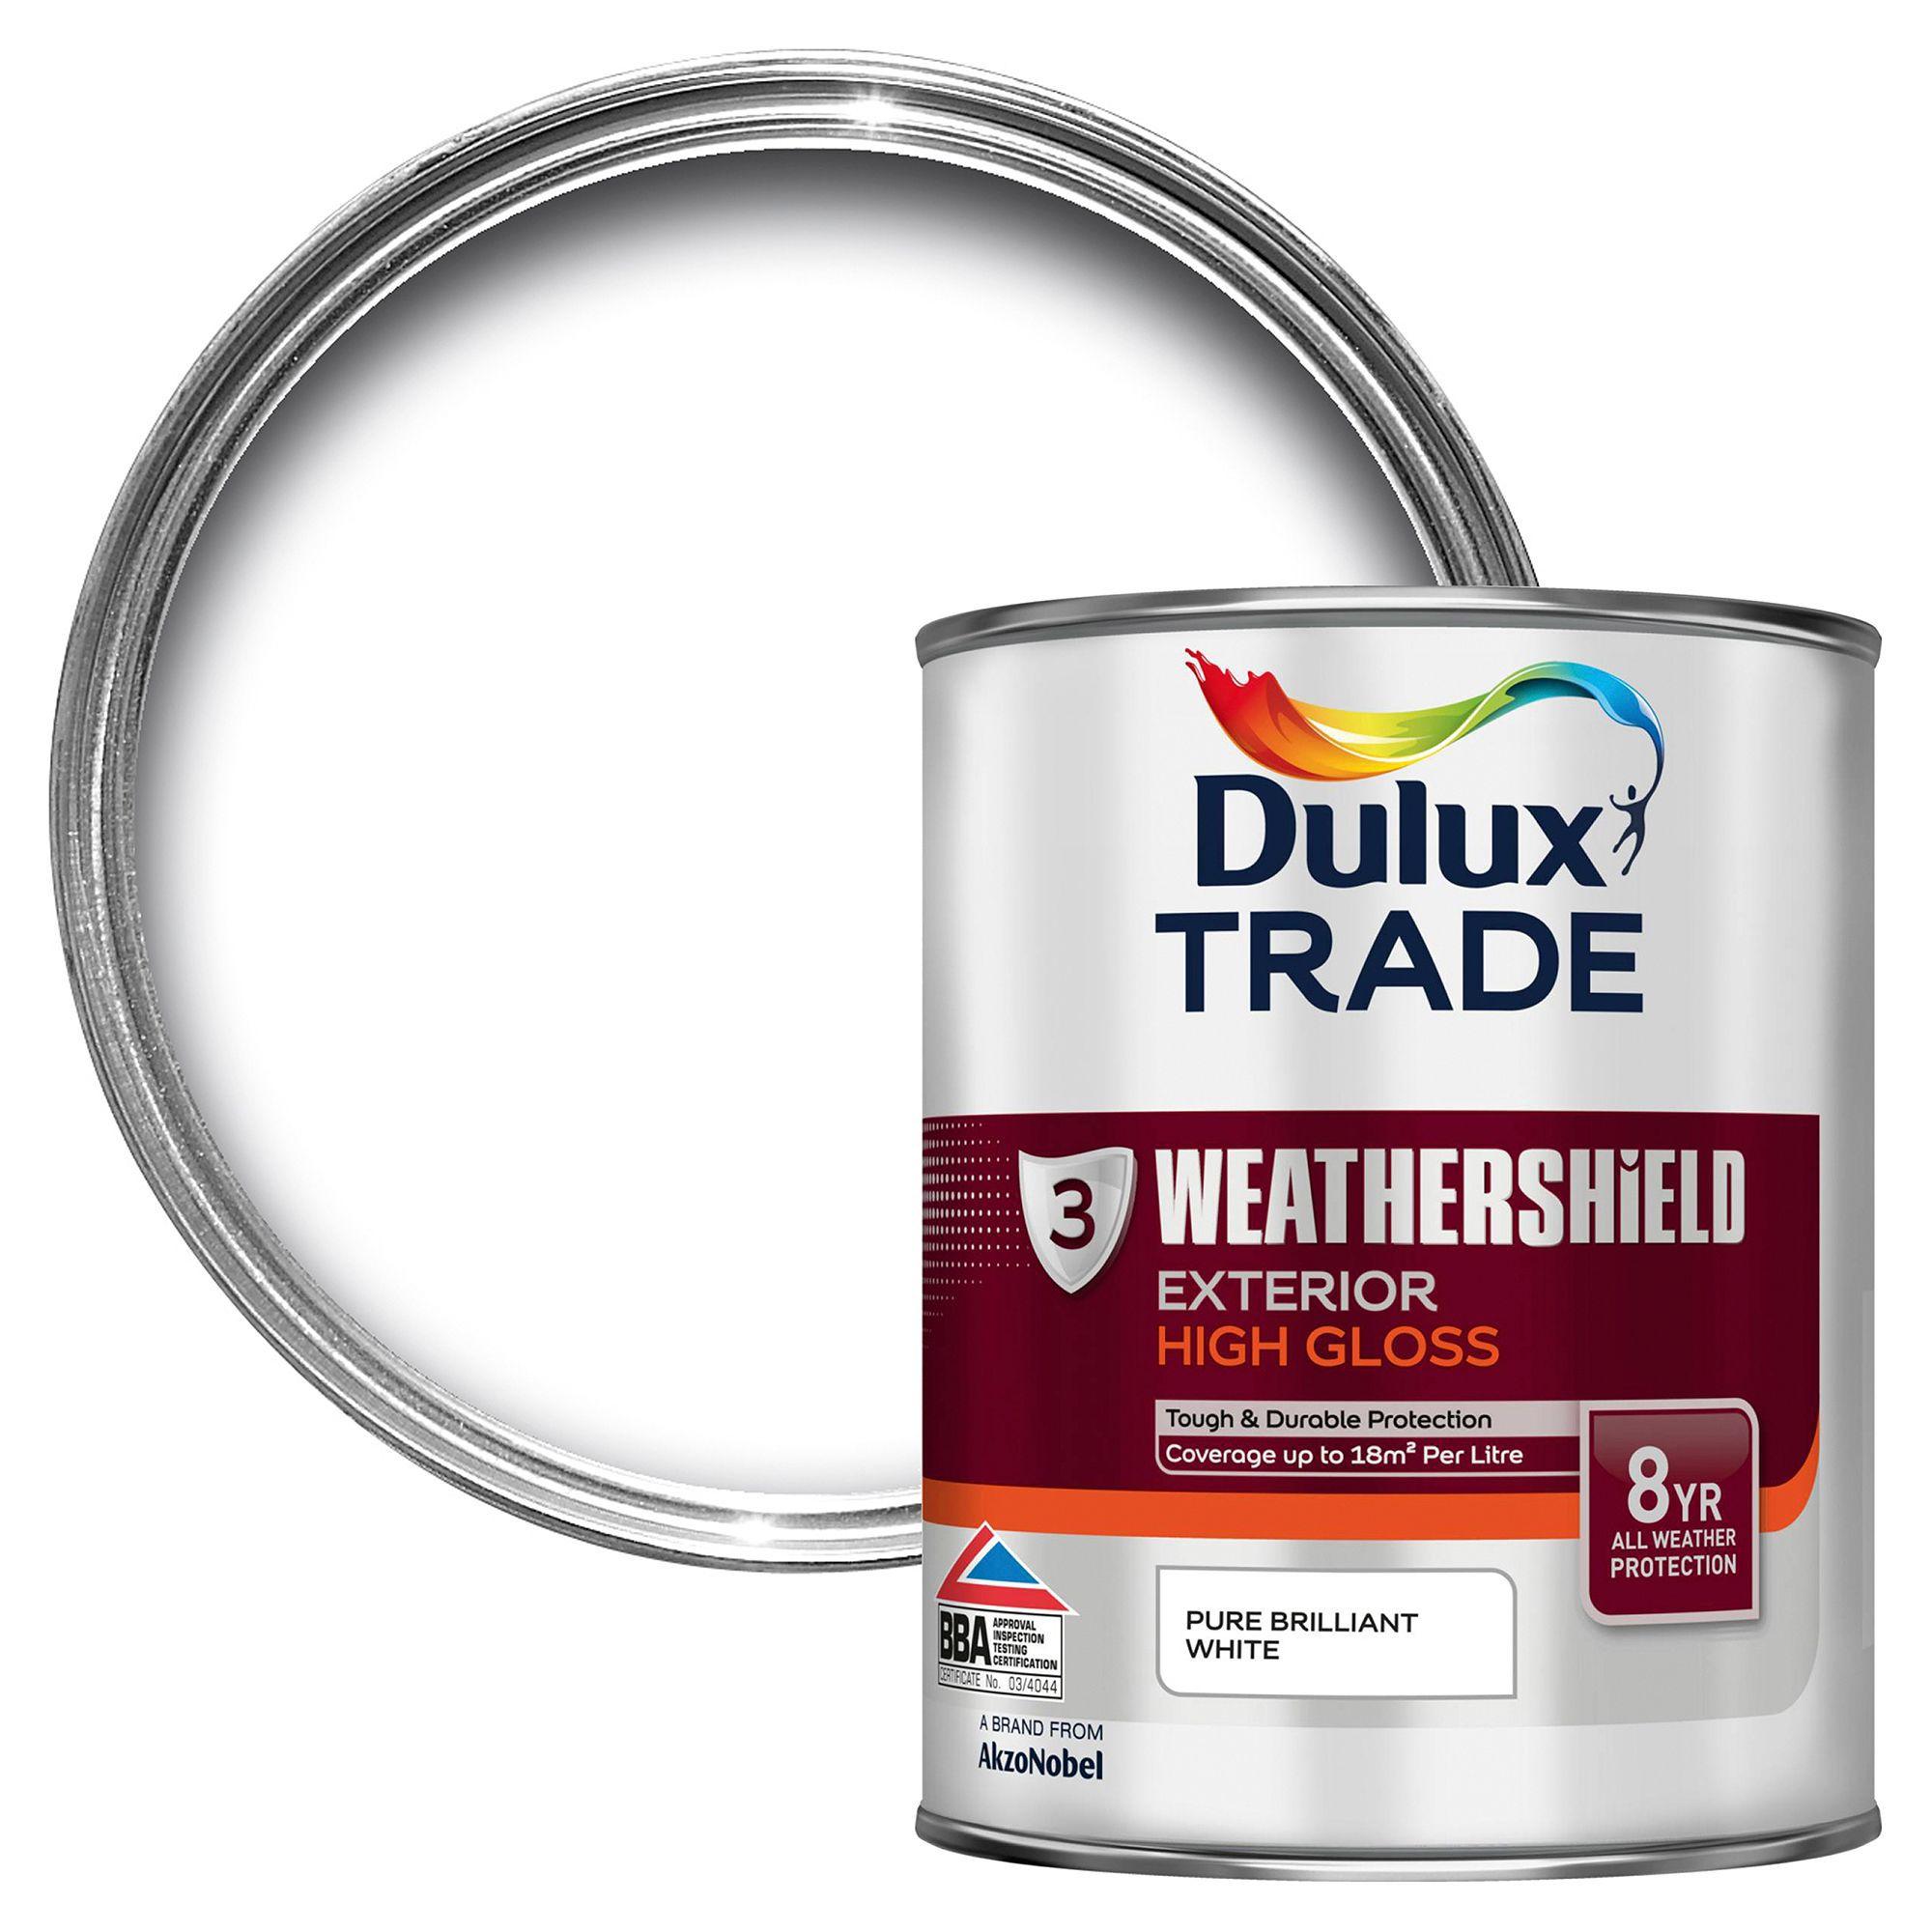 Dulux Trade Exterior Pure Brilliant White Gloss Multipurpose Paint 1L